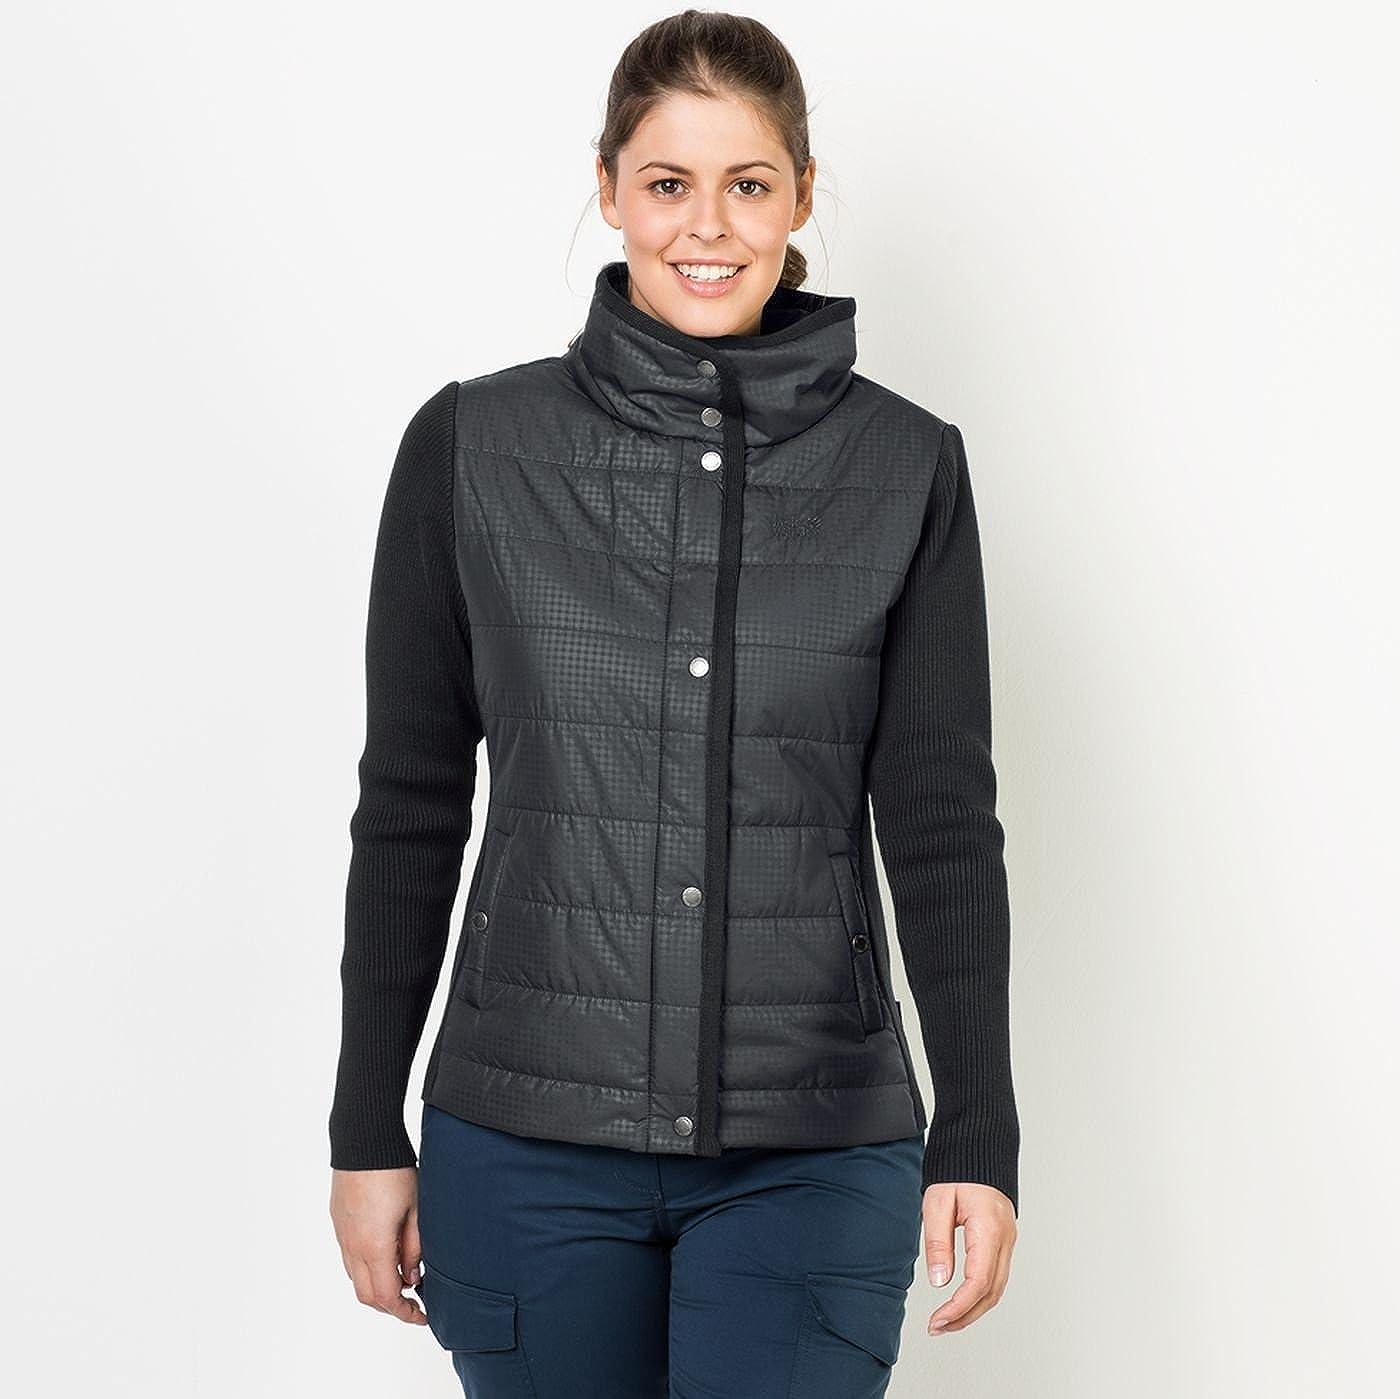 e4ad6dc6381 Jack Wolfskin Women s Clarington Black All Over X-Small at Amazon Women s  Coats Shop